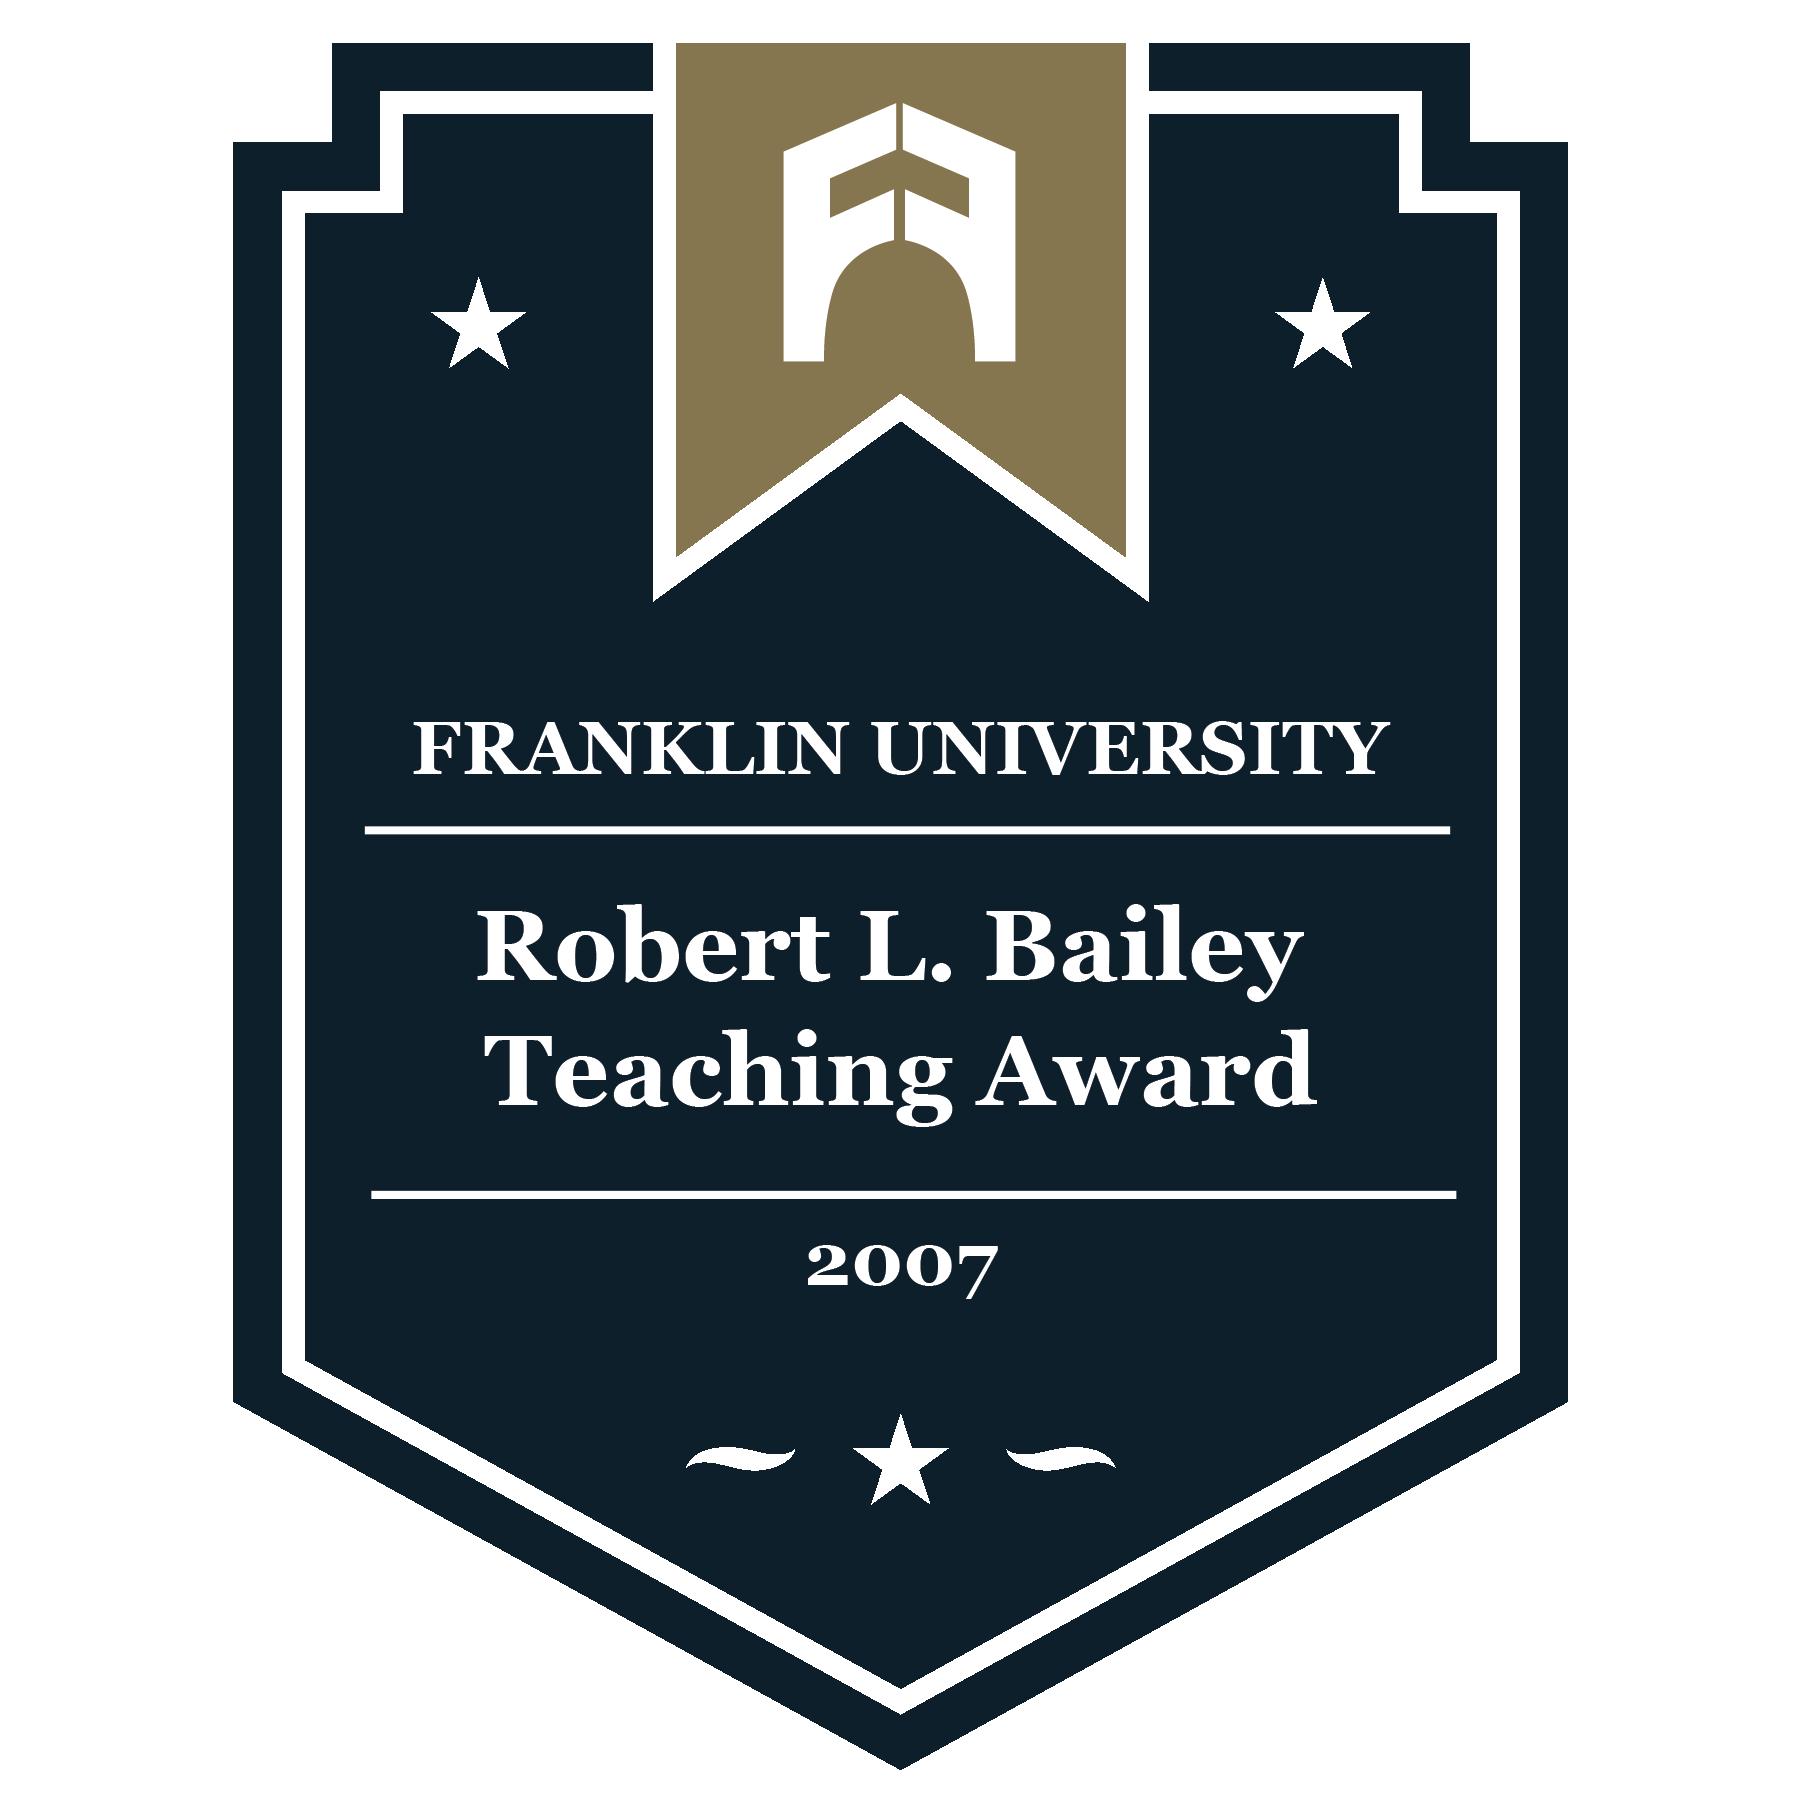 2007 Robert L. Bailey Teaching Award